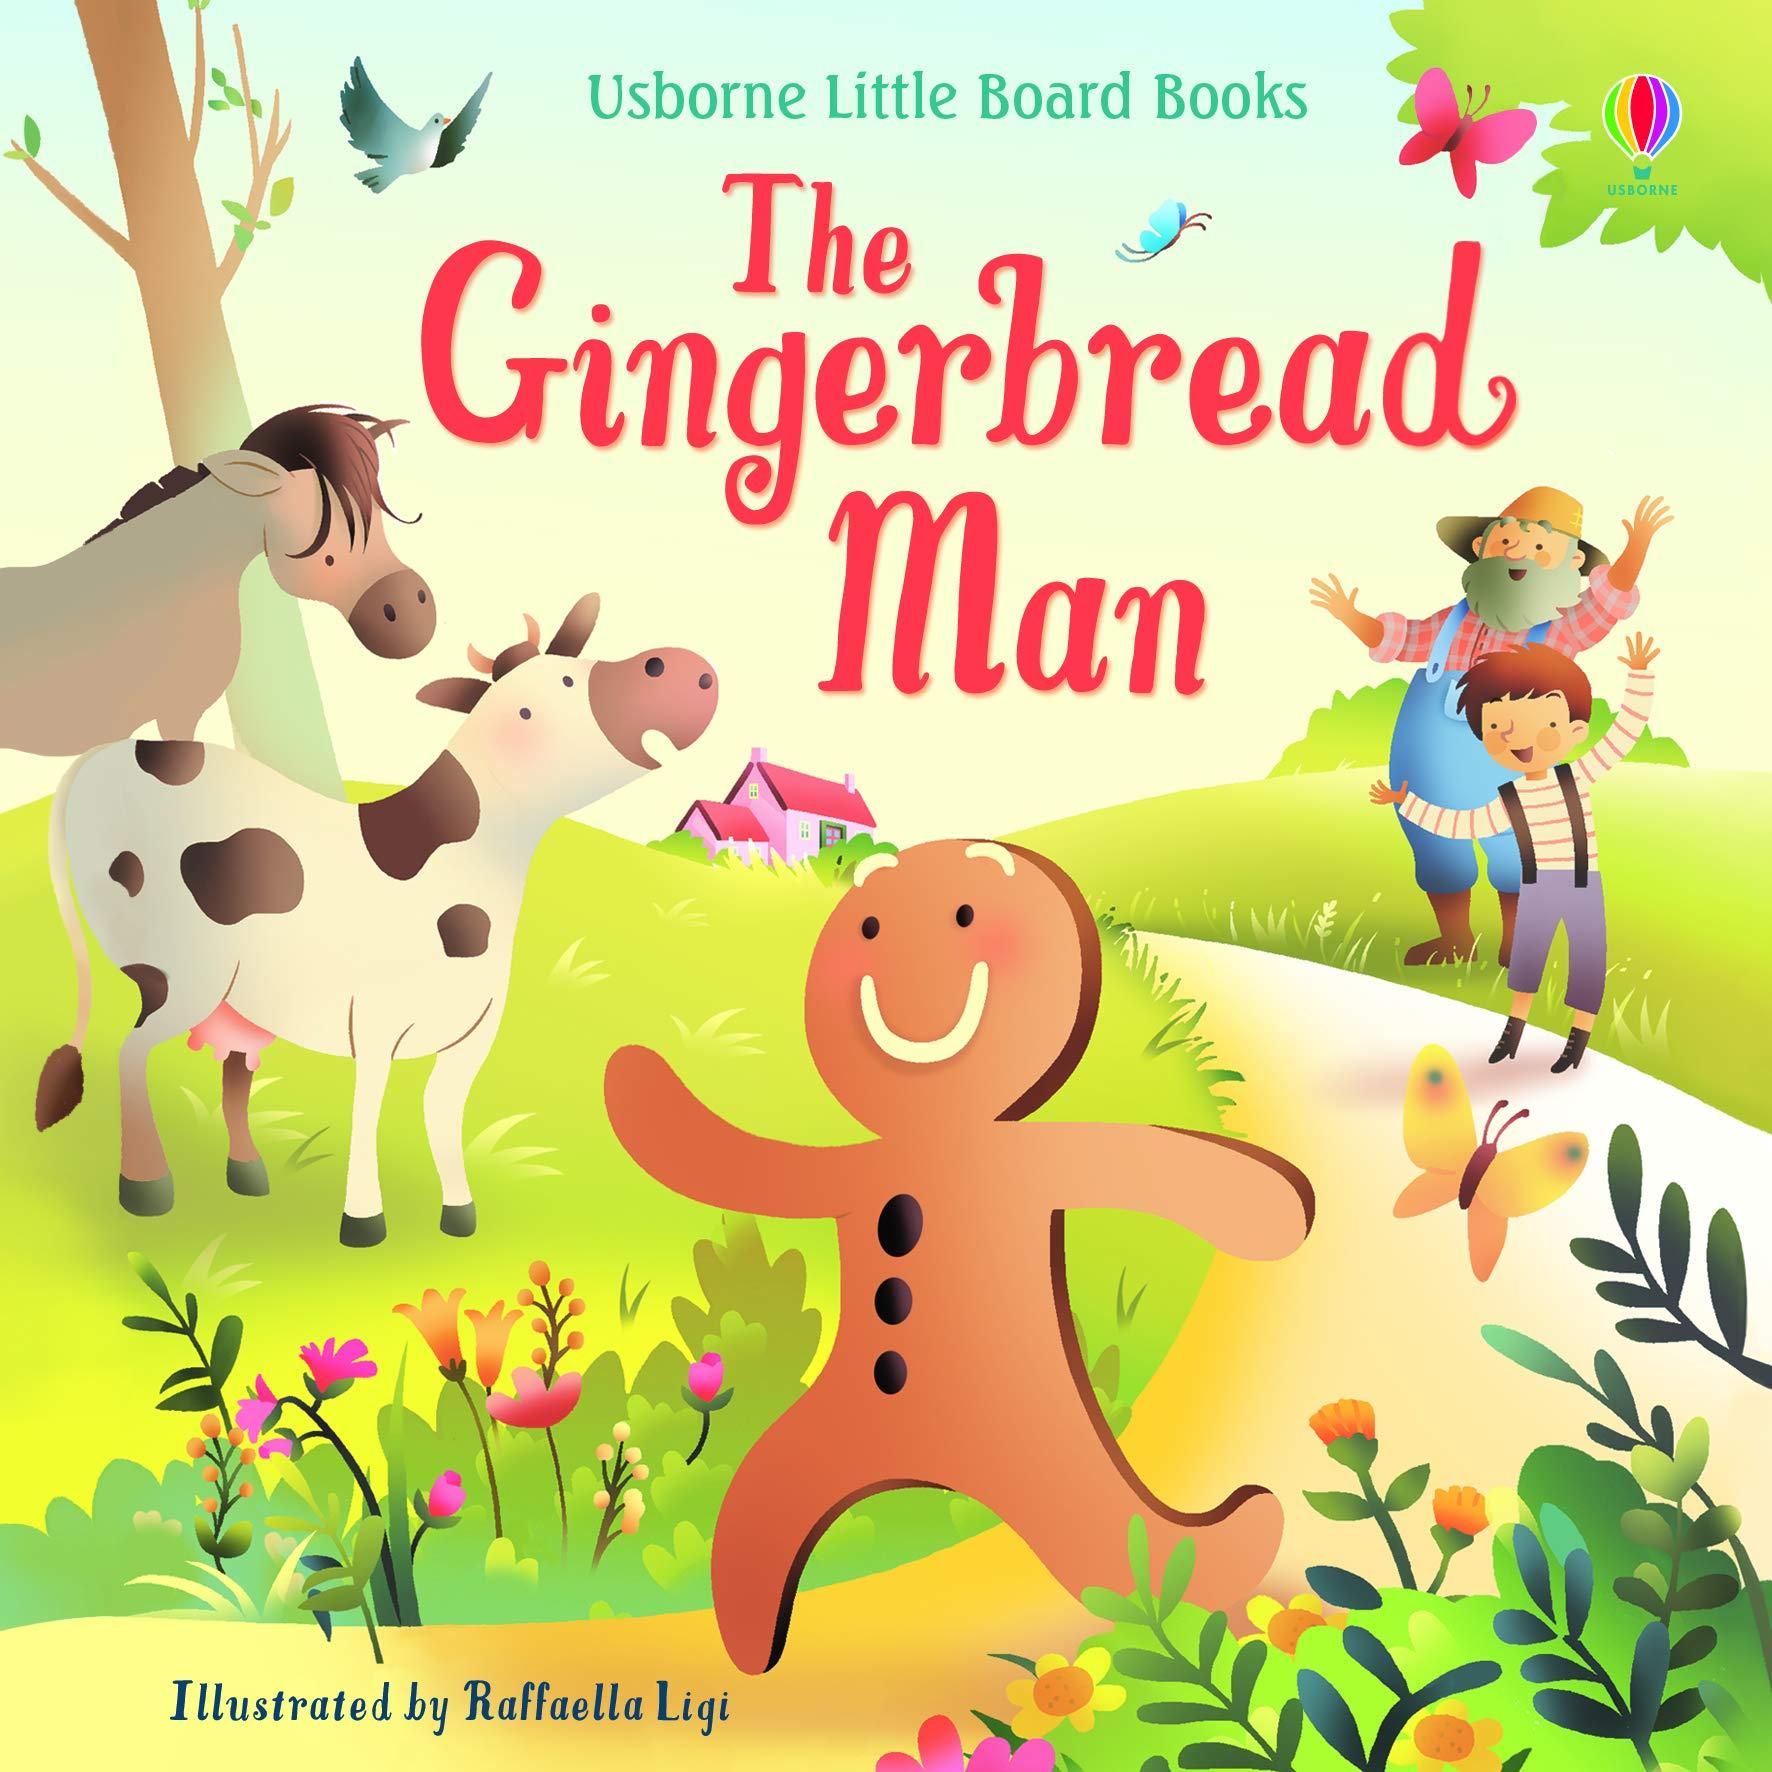 The Gingerbread Man (Usborne Listen and Read Story Books): Amazon.co.uk:  Lesley Sims, Raffaella Ligi, Raffaella Ligi: 9781474969598: Books